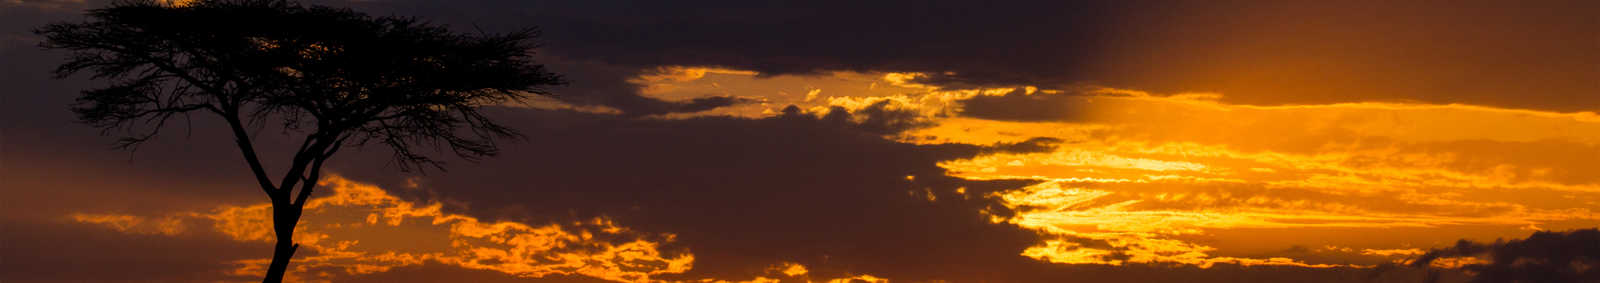 Wildbeast sunset, Masai Mara - Copyright Paul Goldstein